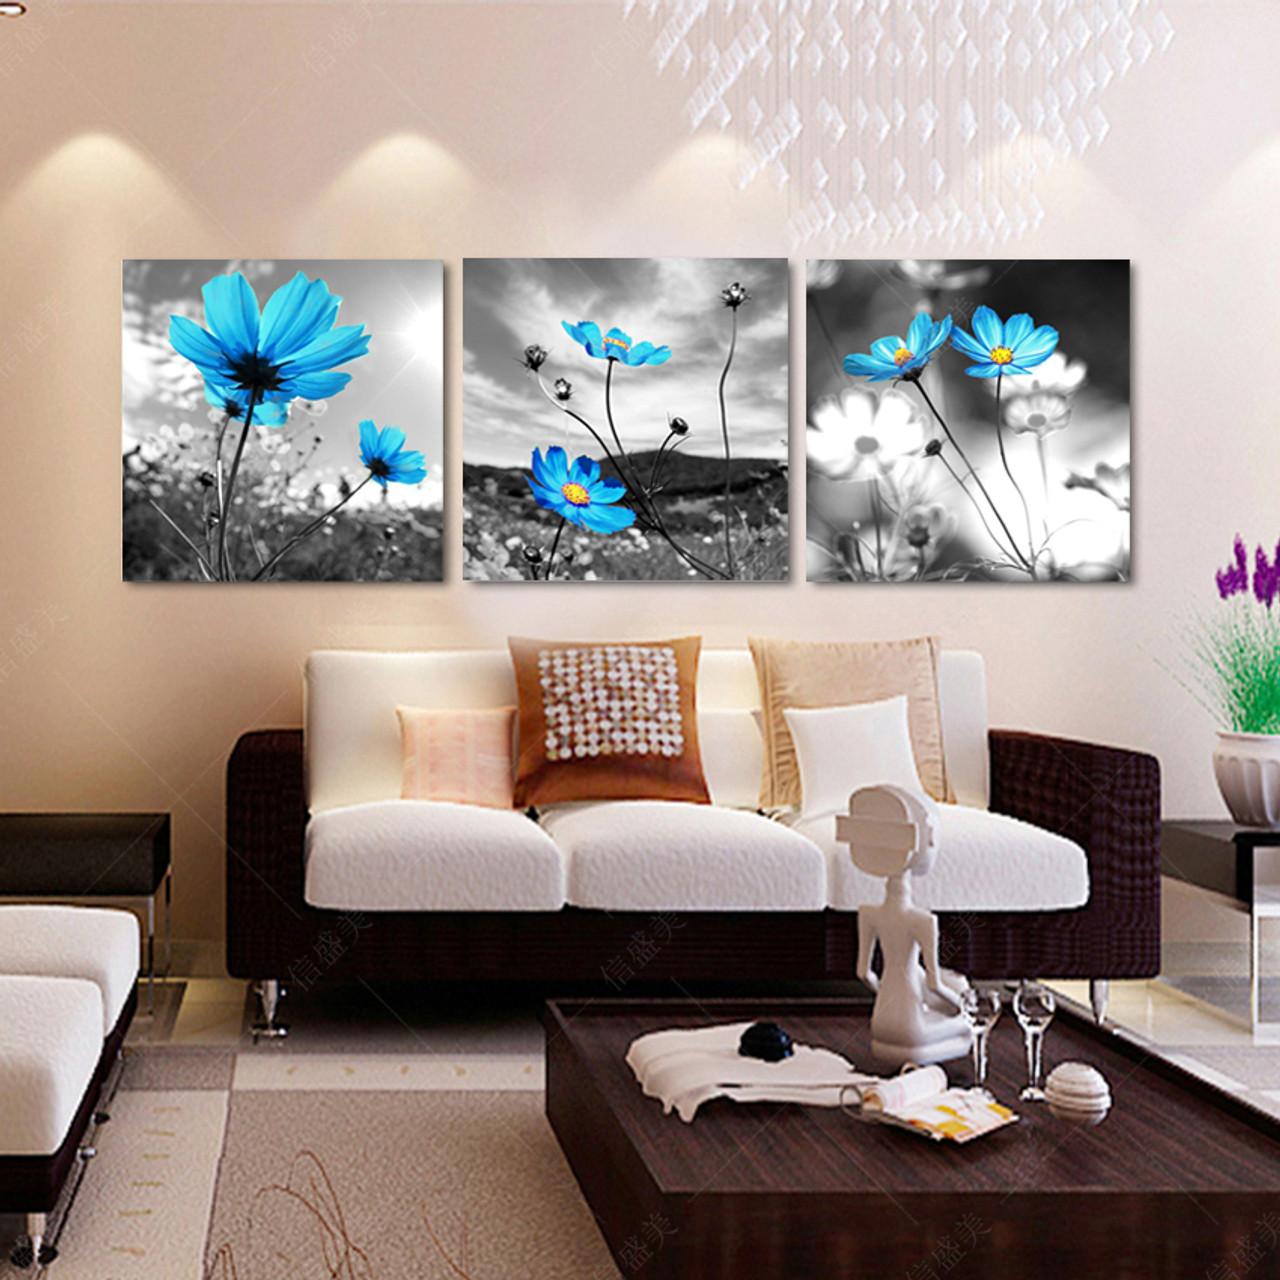 ... 3 Piece Hd Print Canvas Modern Schilderij Flowers Oil Paintings Painting  Wall Art Bedroom Cuadros Decoracion ...